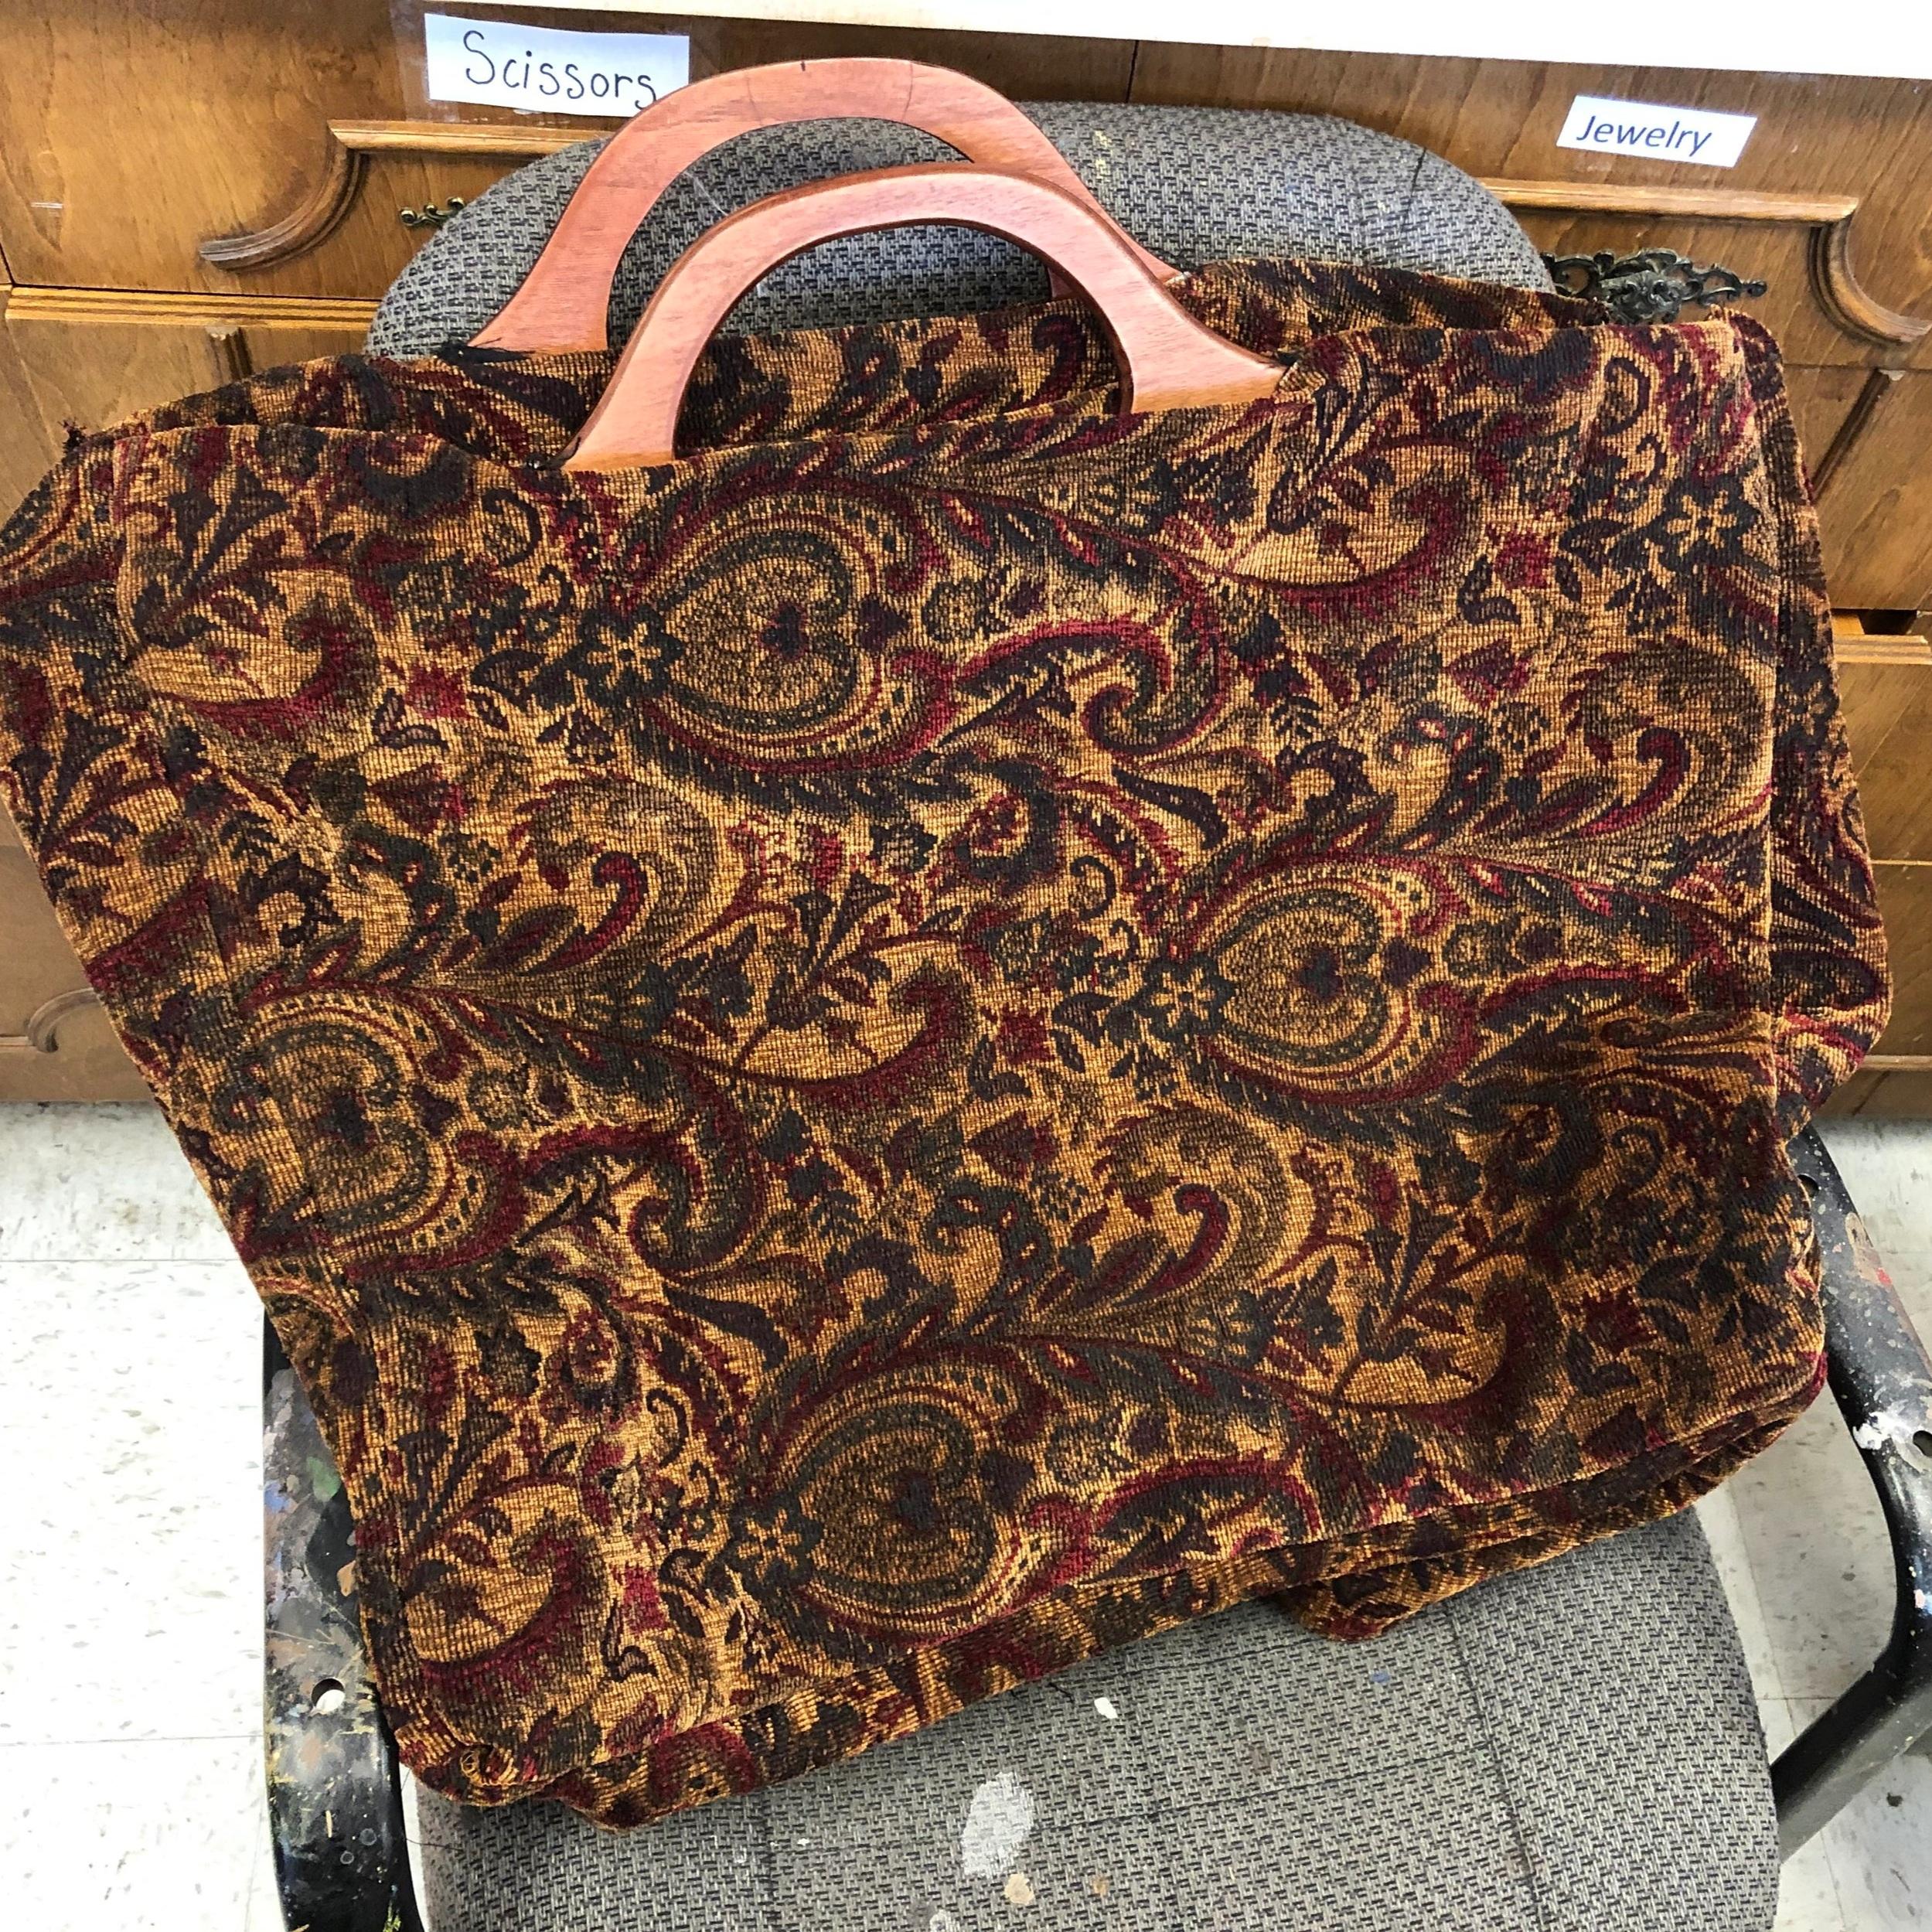 Magic Carpet Bag   Mary Poppins   Utah Festival Opera and Musical Theatre, 2019